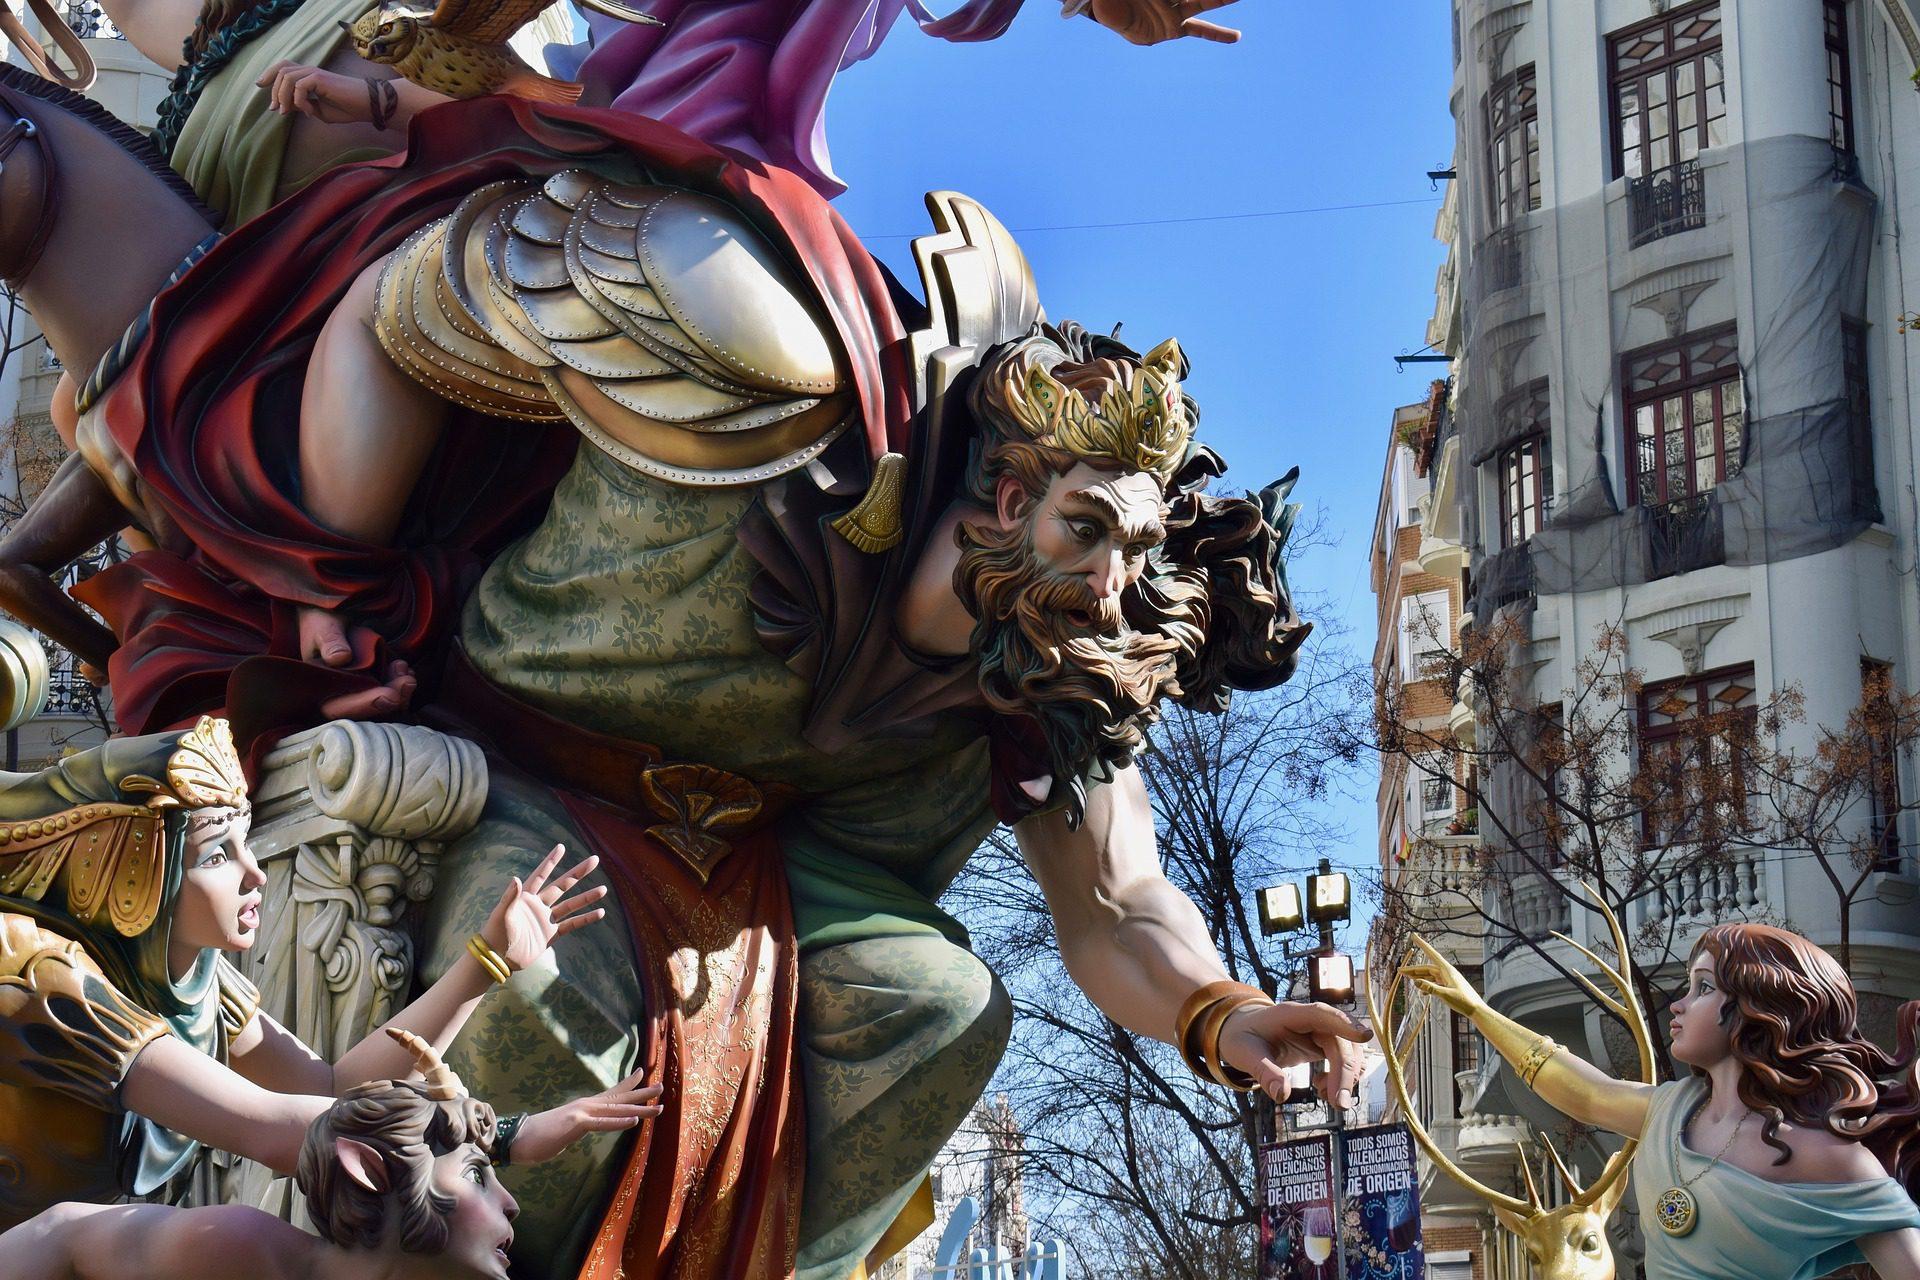 Festival Las Fallas de Valence